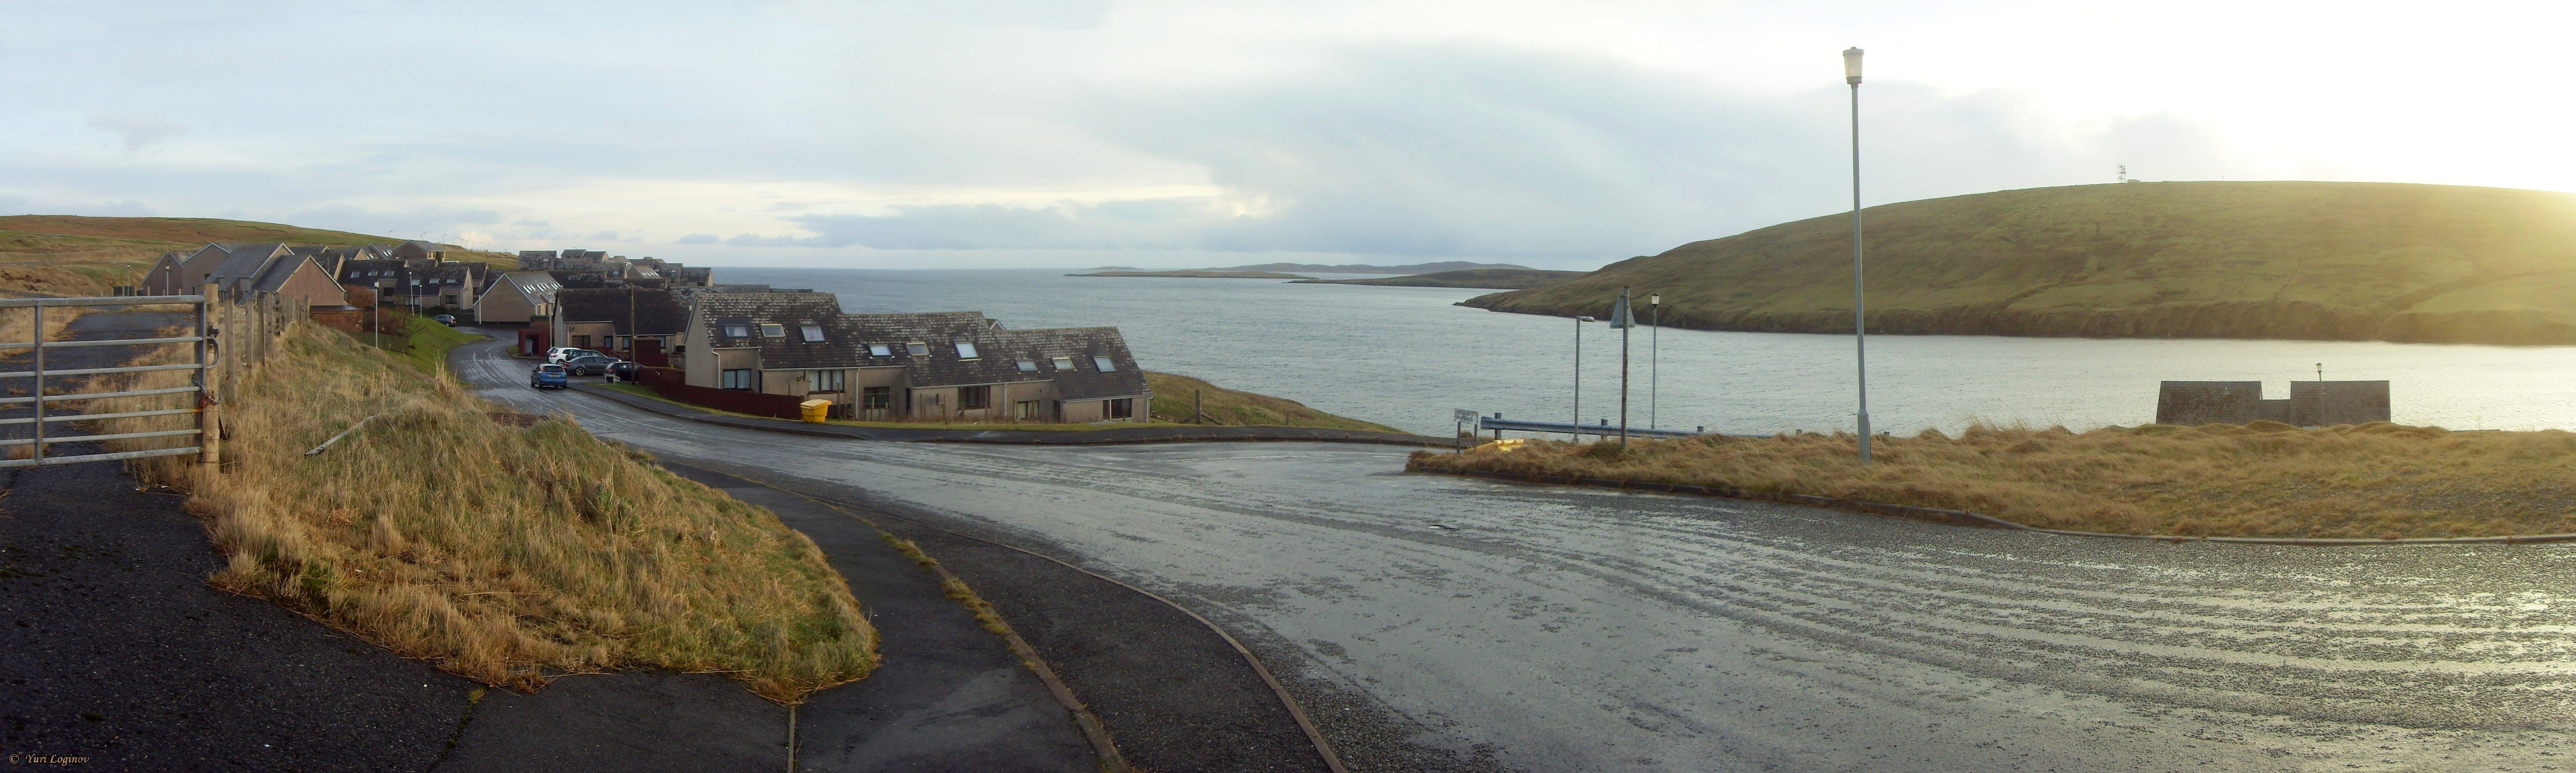 Free stock photo of scotland, united kingdom, Shetland, Shetland Islands